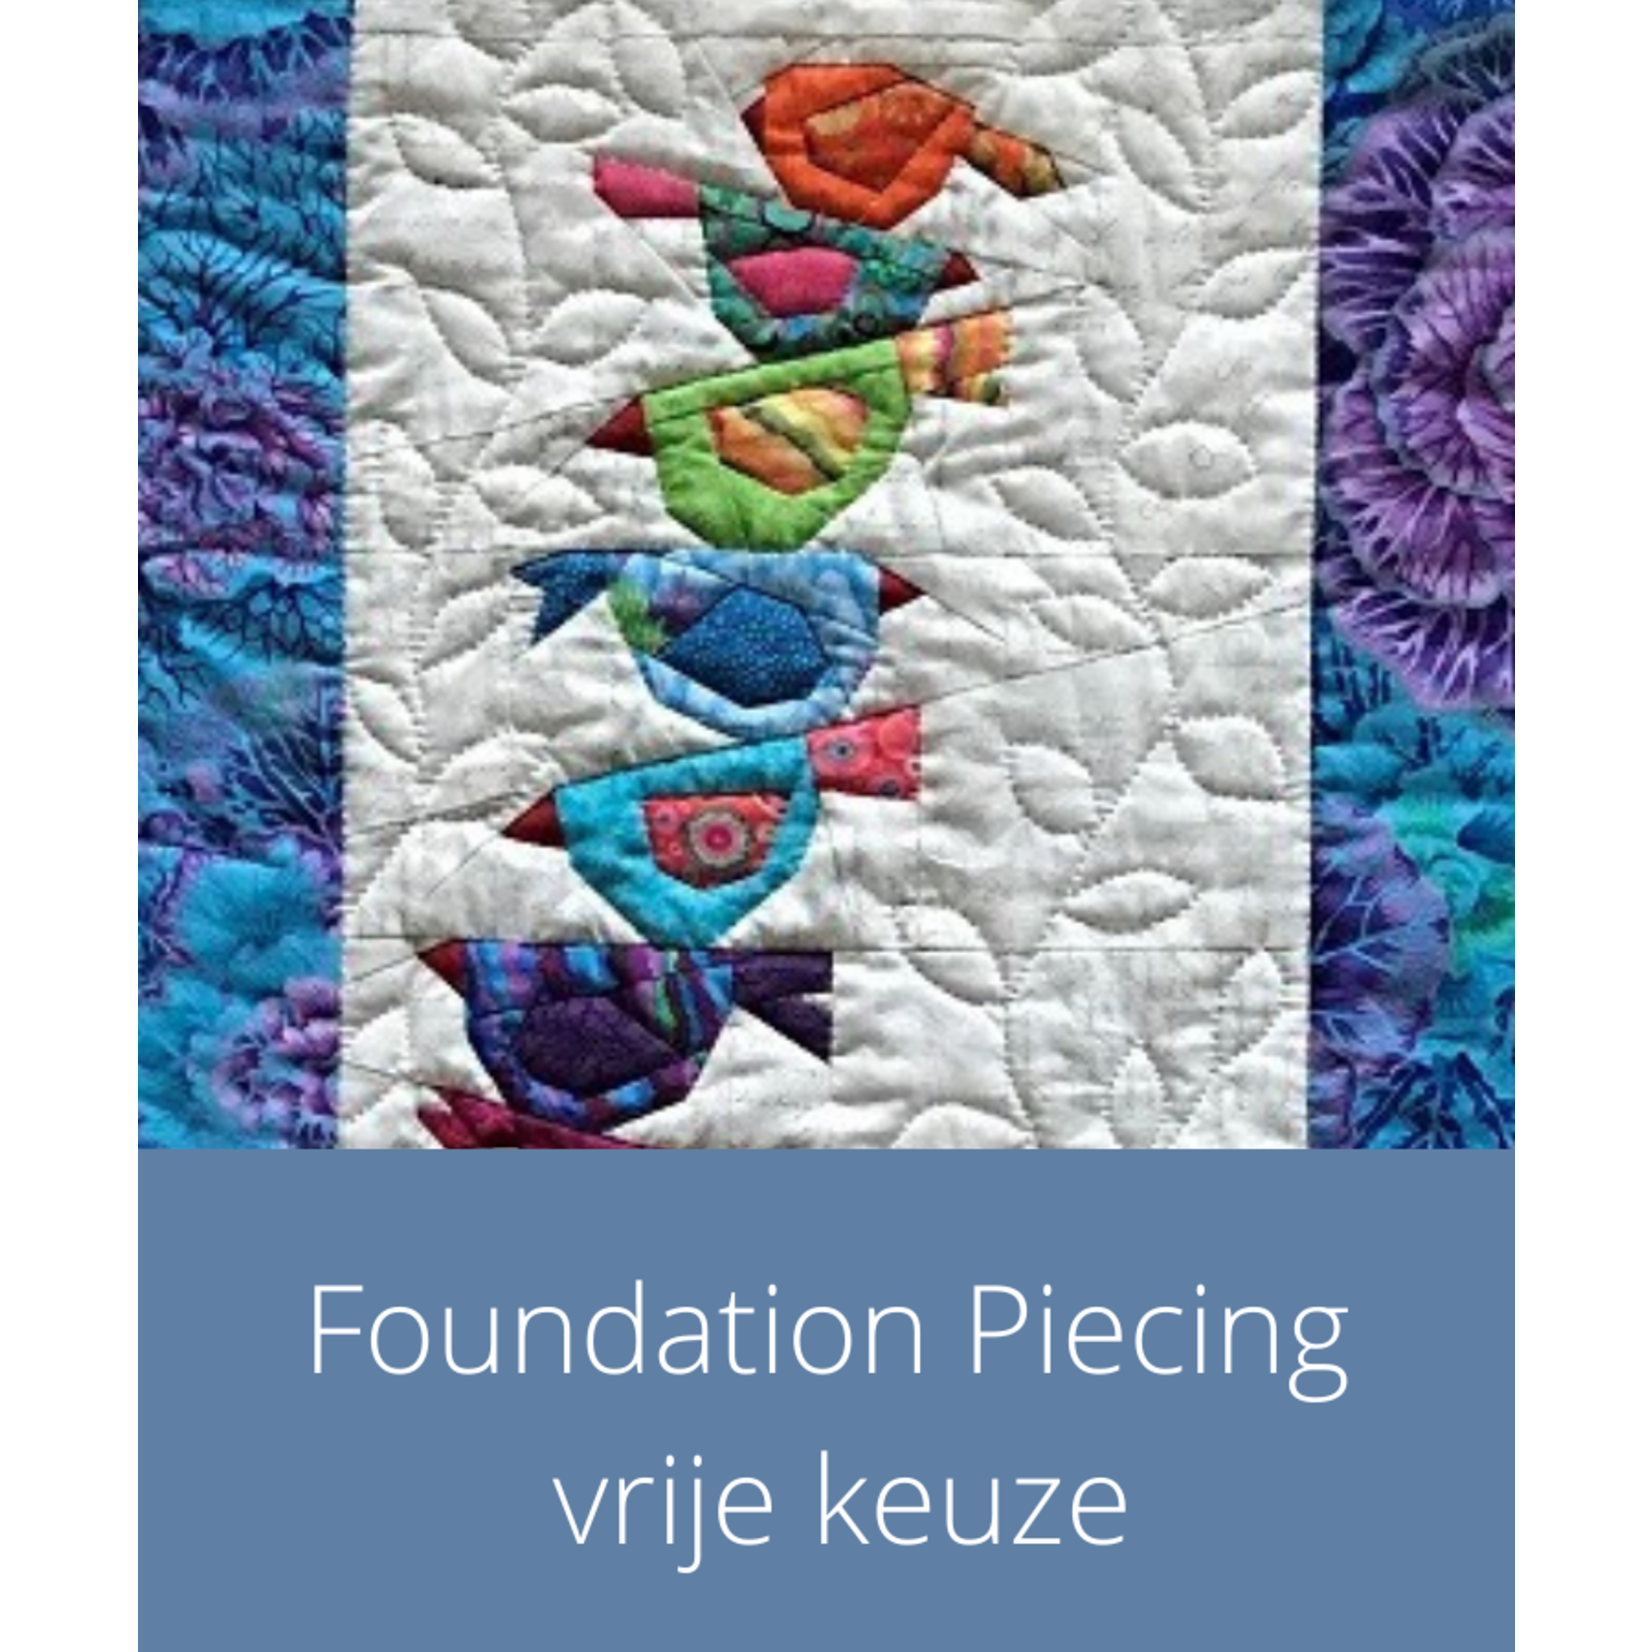 Cursus - Foundation Piecing vrije keuze | vrijdag 19 november